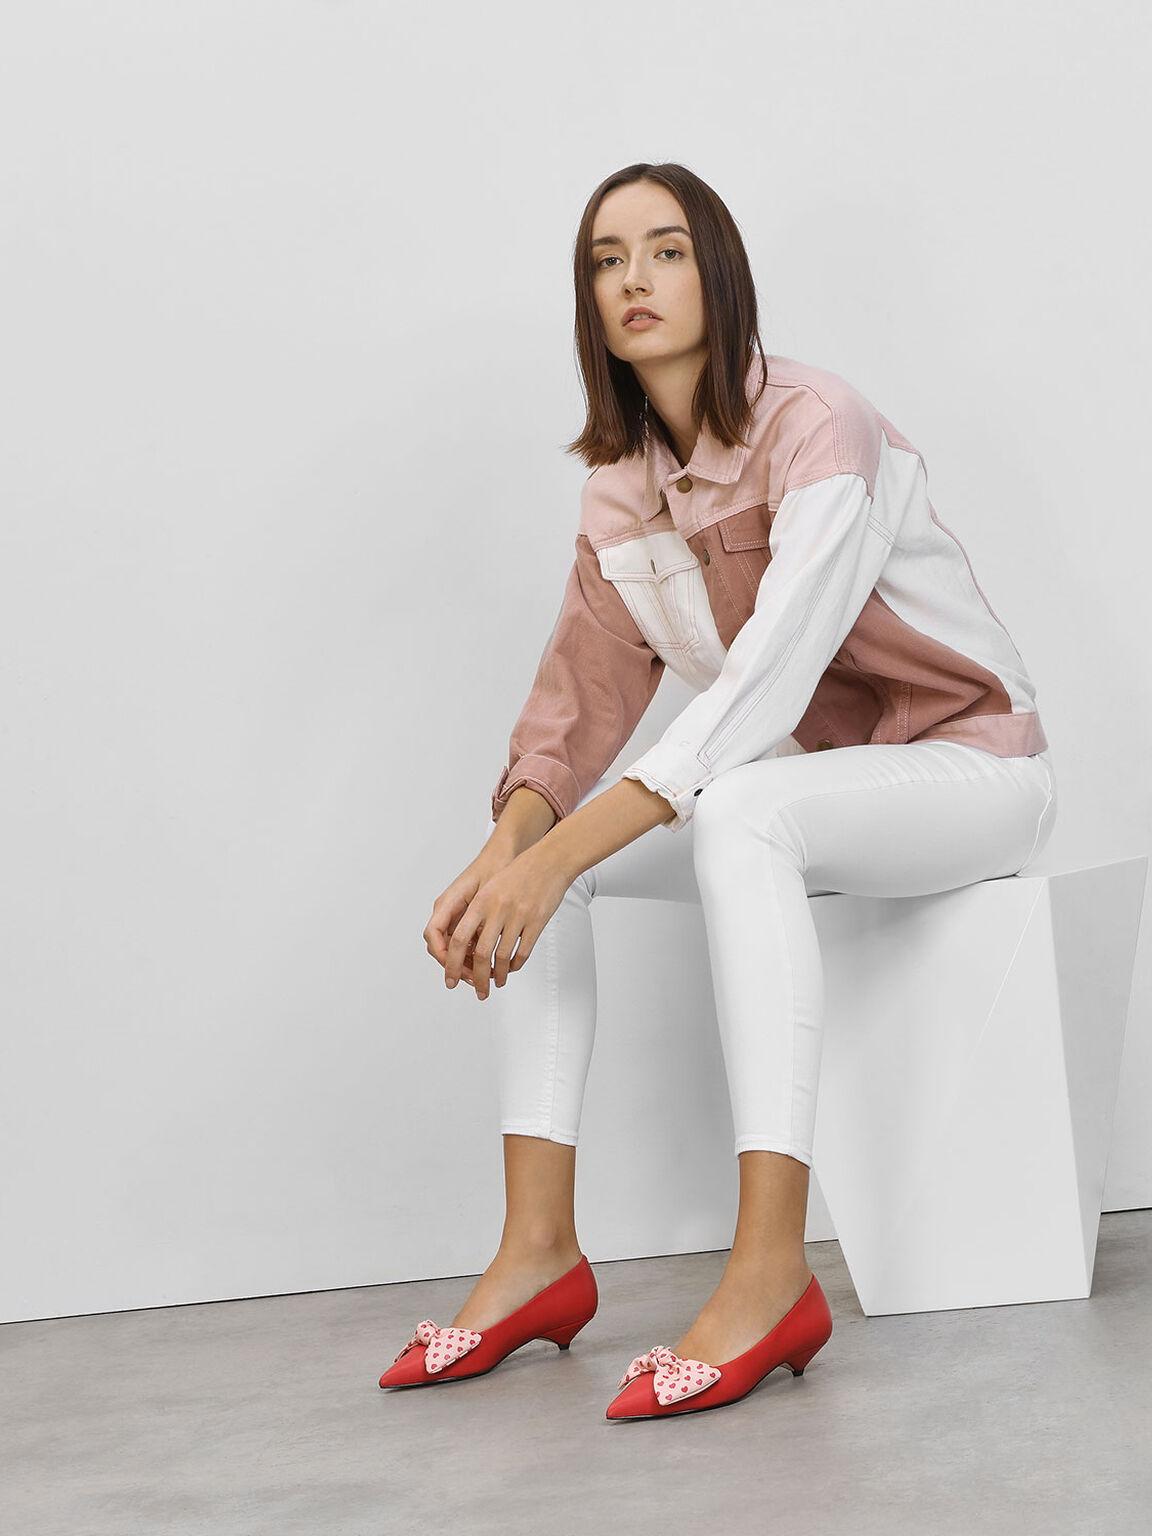 蝴蝶結低跟鞋, 紅色, hi-res